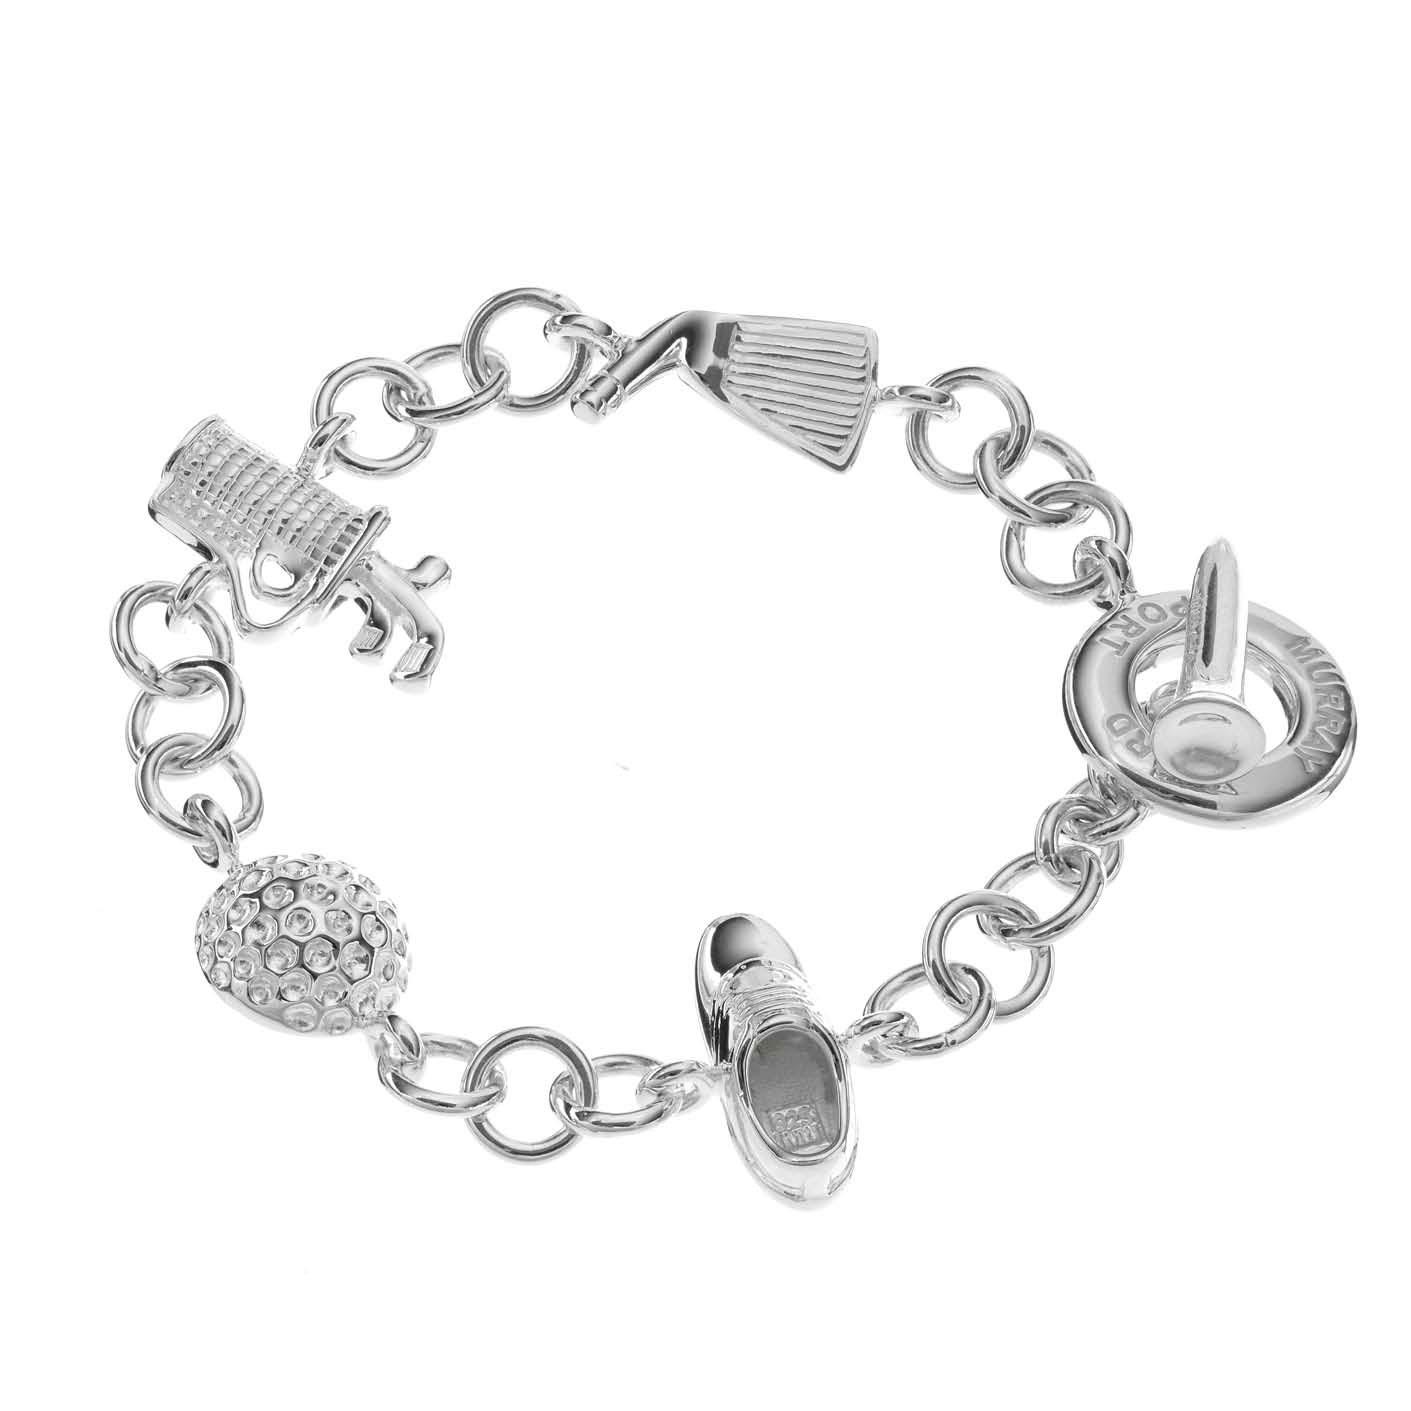 Sterling Silver Golf Charm Bracelet